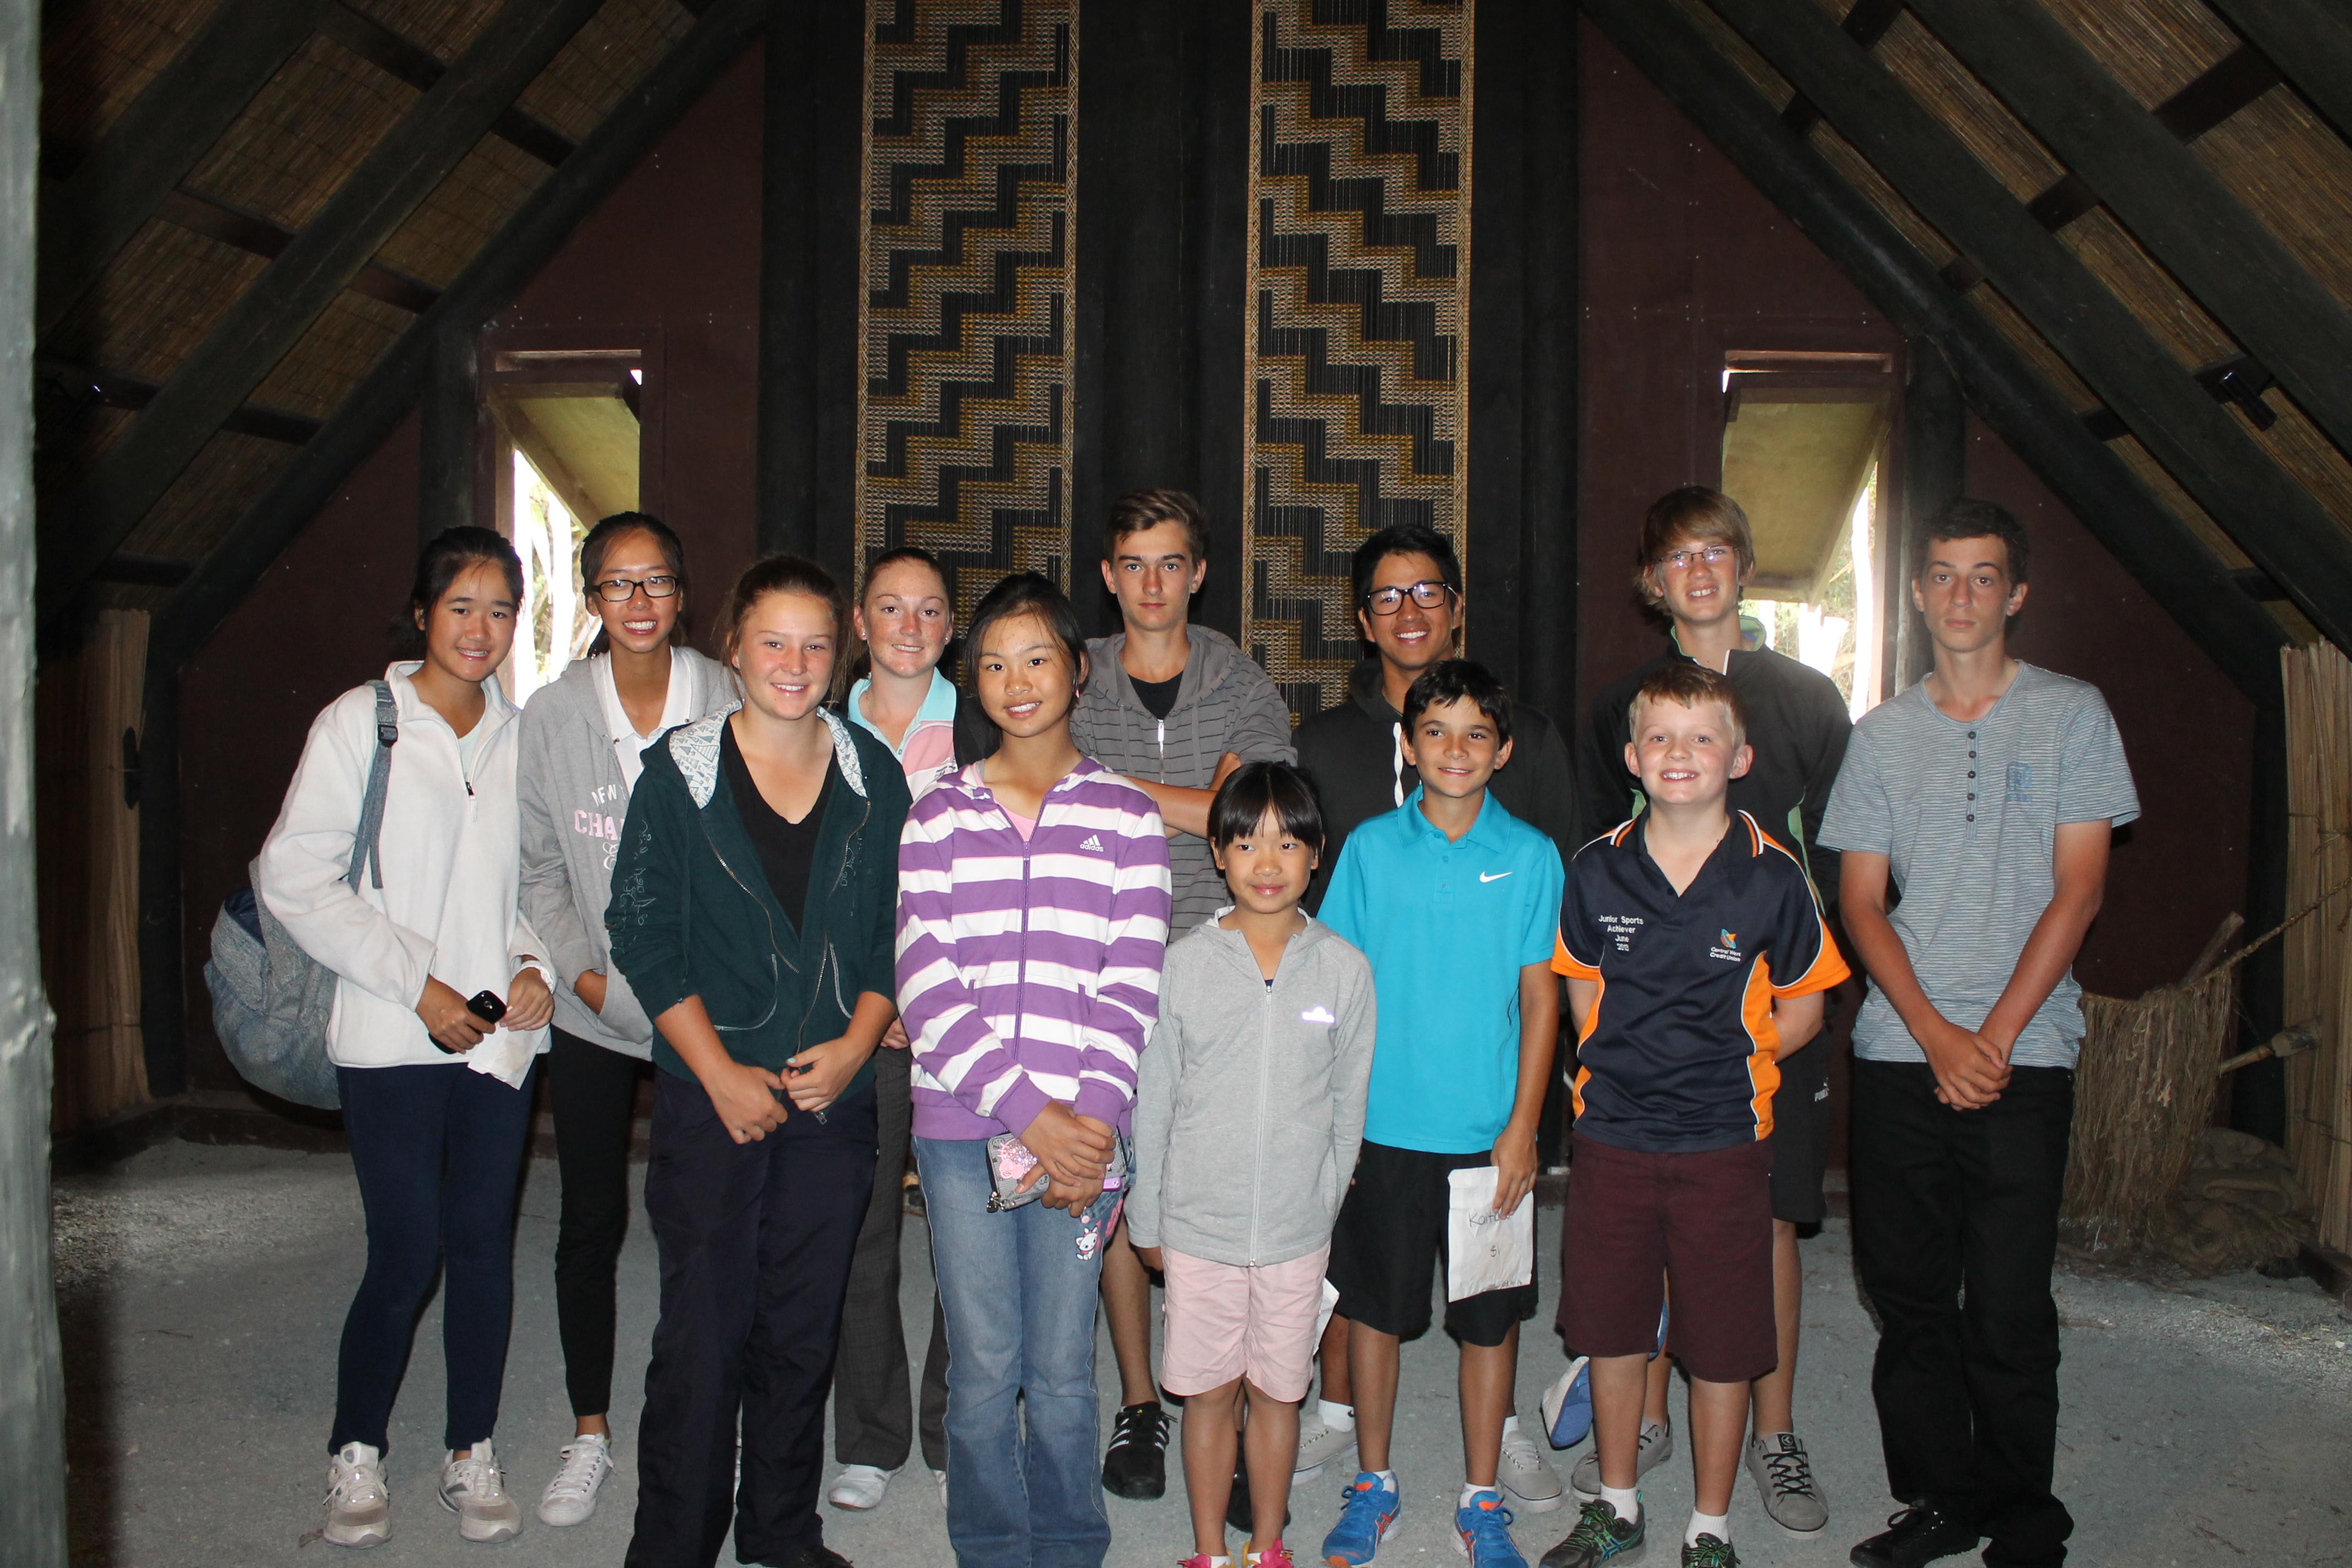 JNJG Schools Team Tour New Zealand | News - Jack Newton